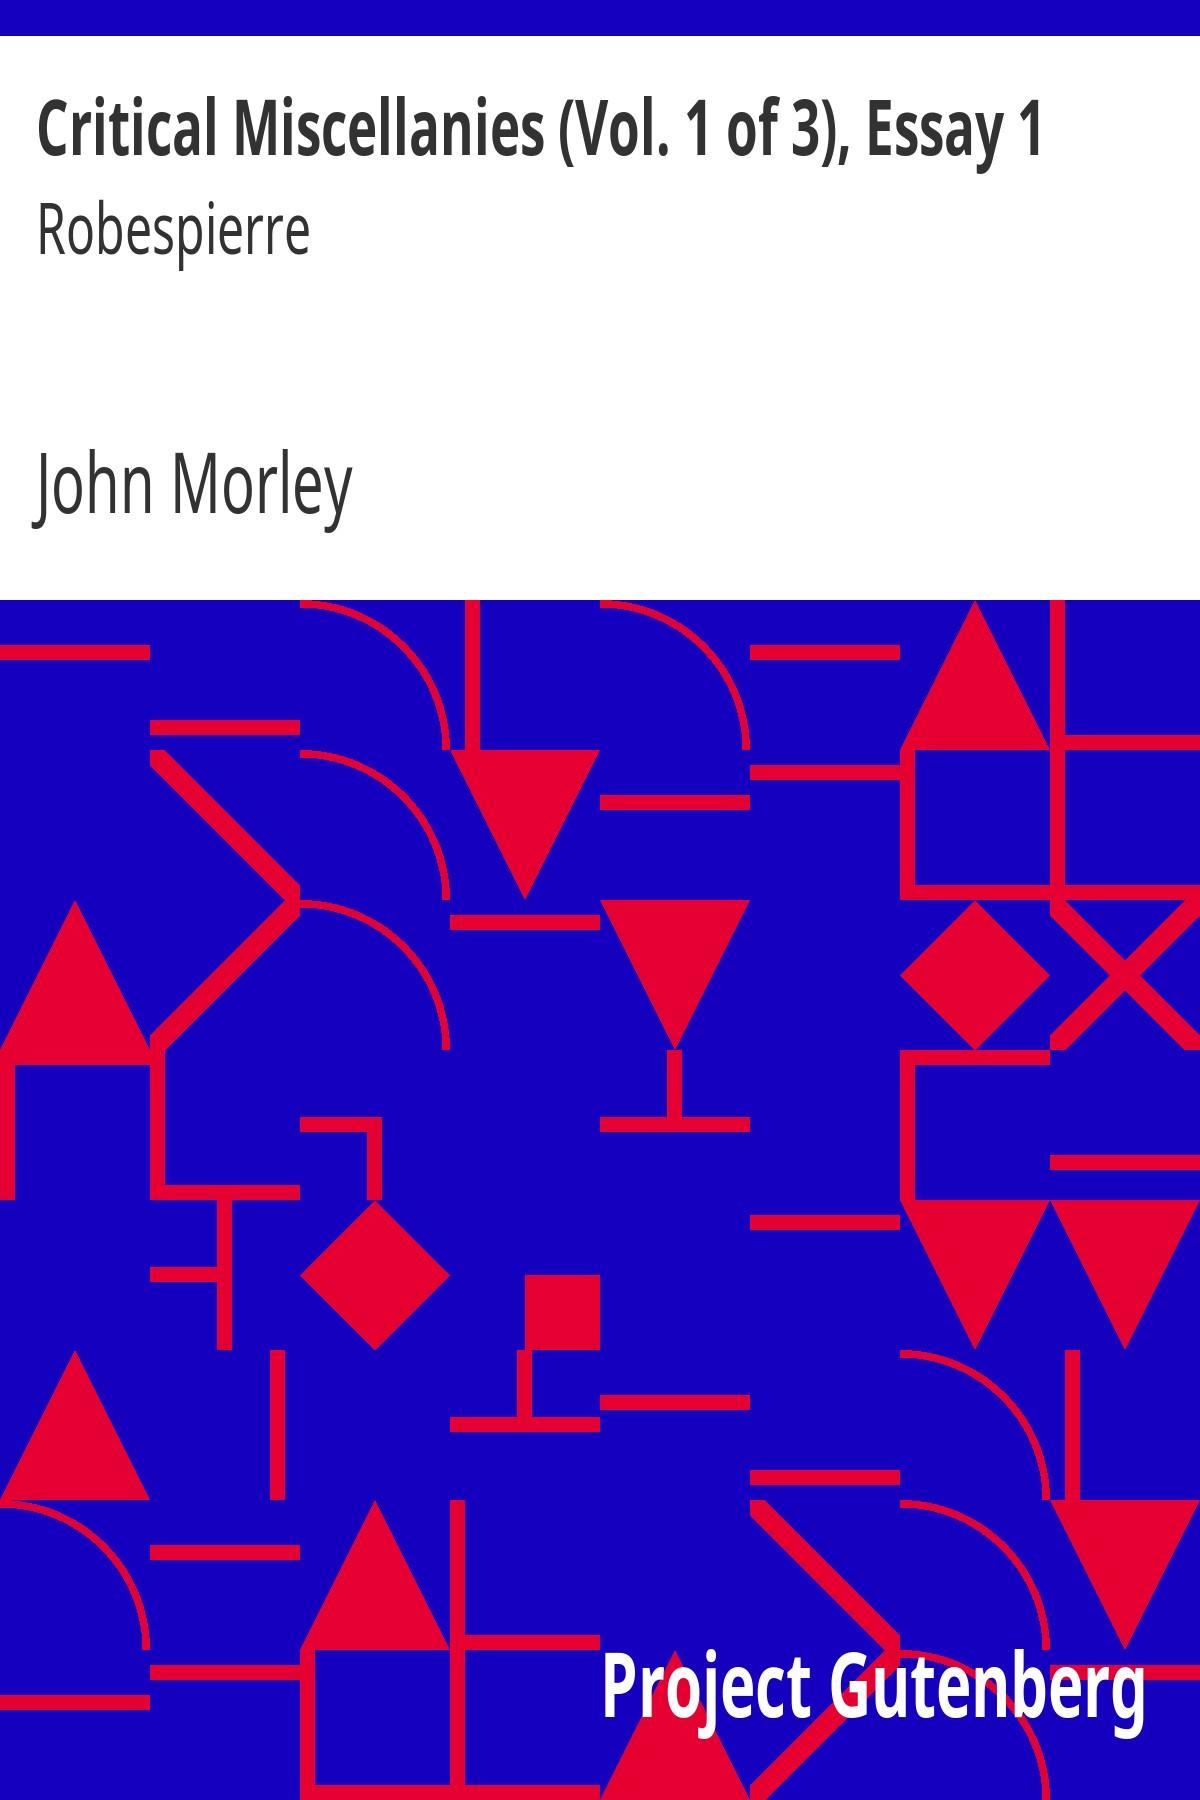 John Morley Critical Miscellanies (Vol. 1 of 3), Essay 1: Robespierre